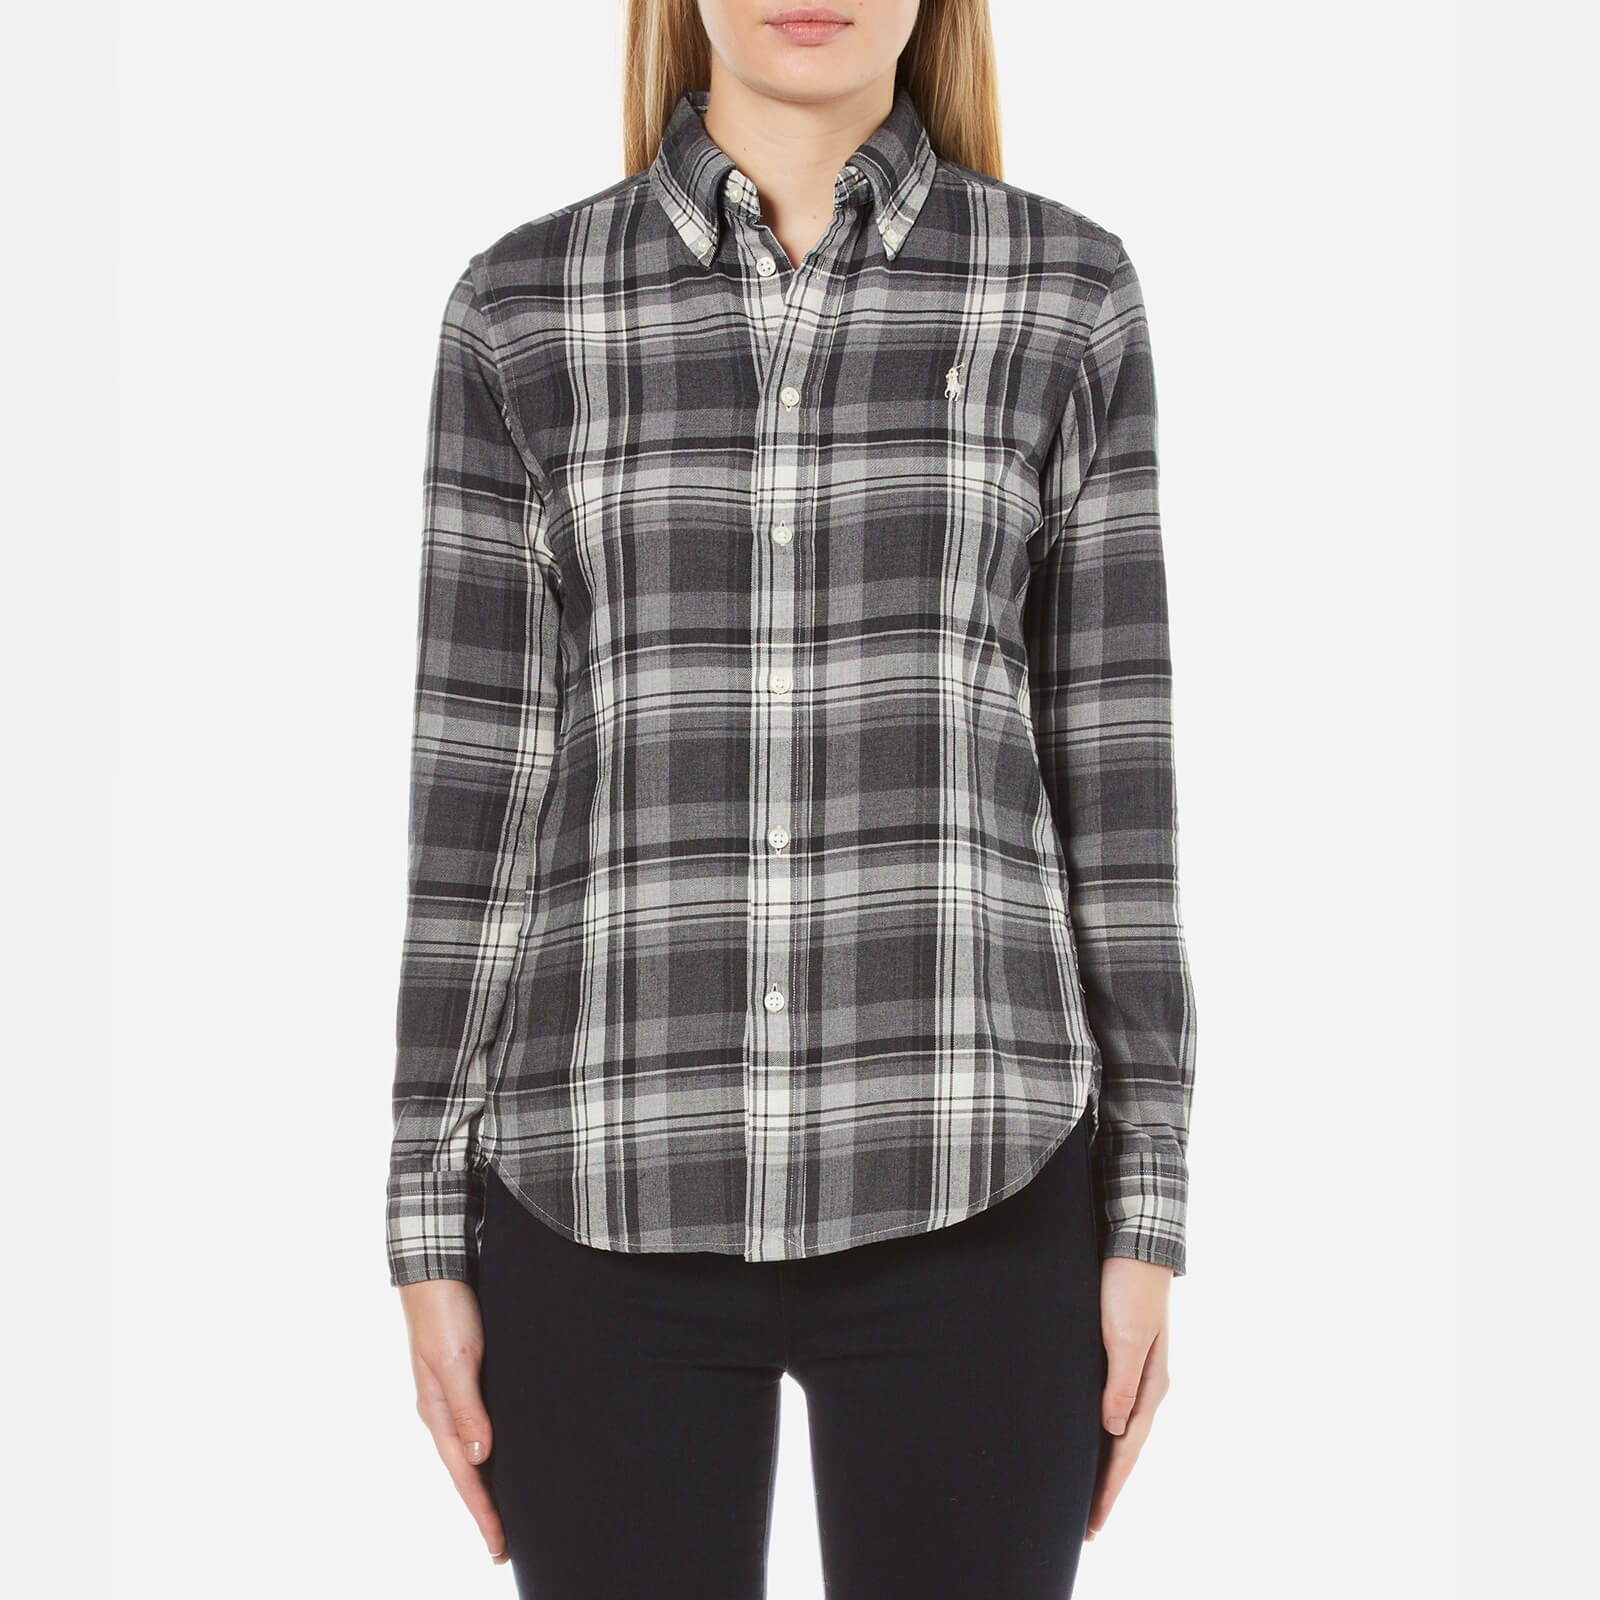 Brushed Shirt Ralph Women's Greyblack Polo Lauren Georgia Plaid 3L4A5Rj